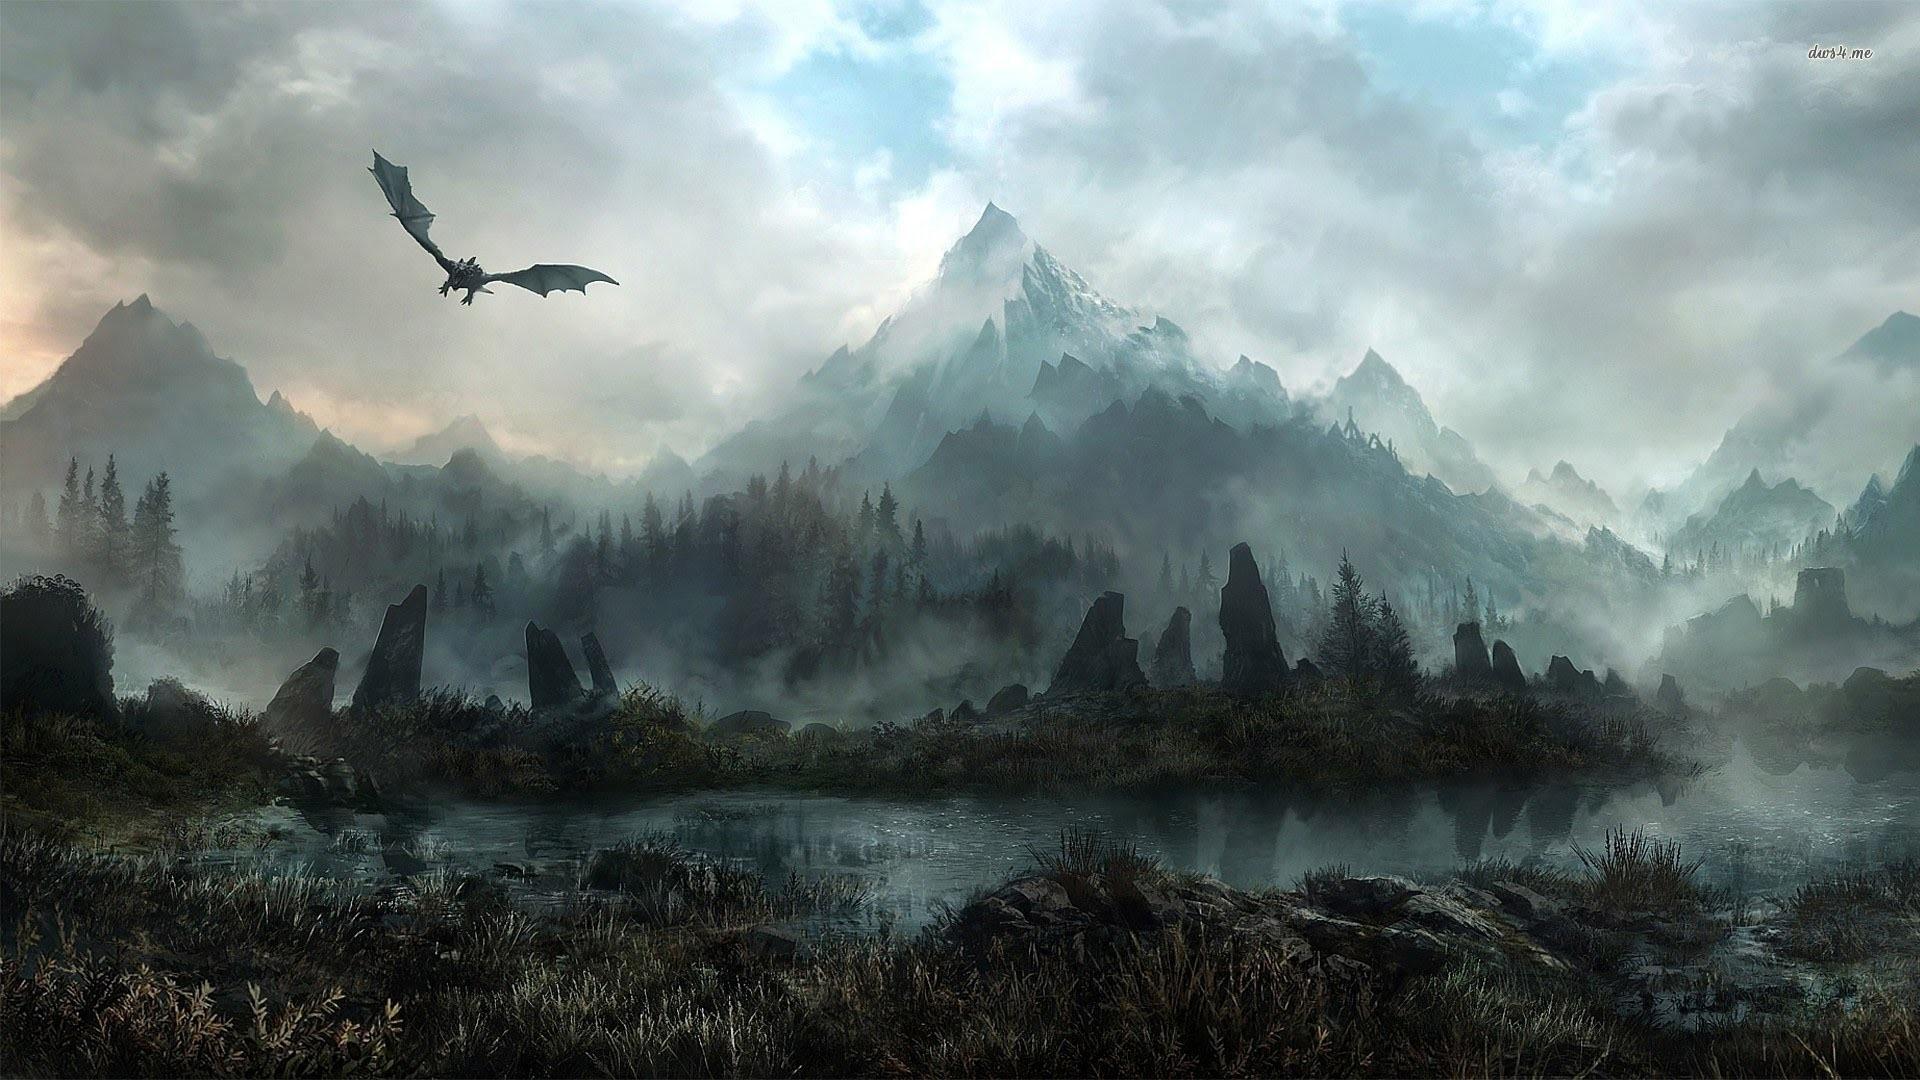 The Elder Scrolls V – Skyrim Game HD desktop wallpaper, Skyrim wallpaper,  The Elder Scrolls wallpaper, The Elder Scrolls V wallpaper – Games no.